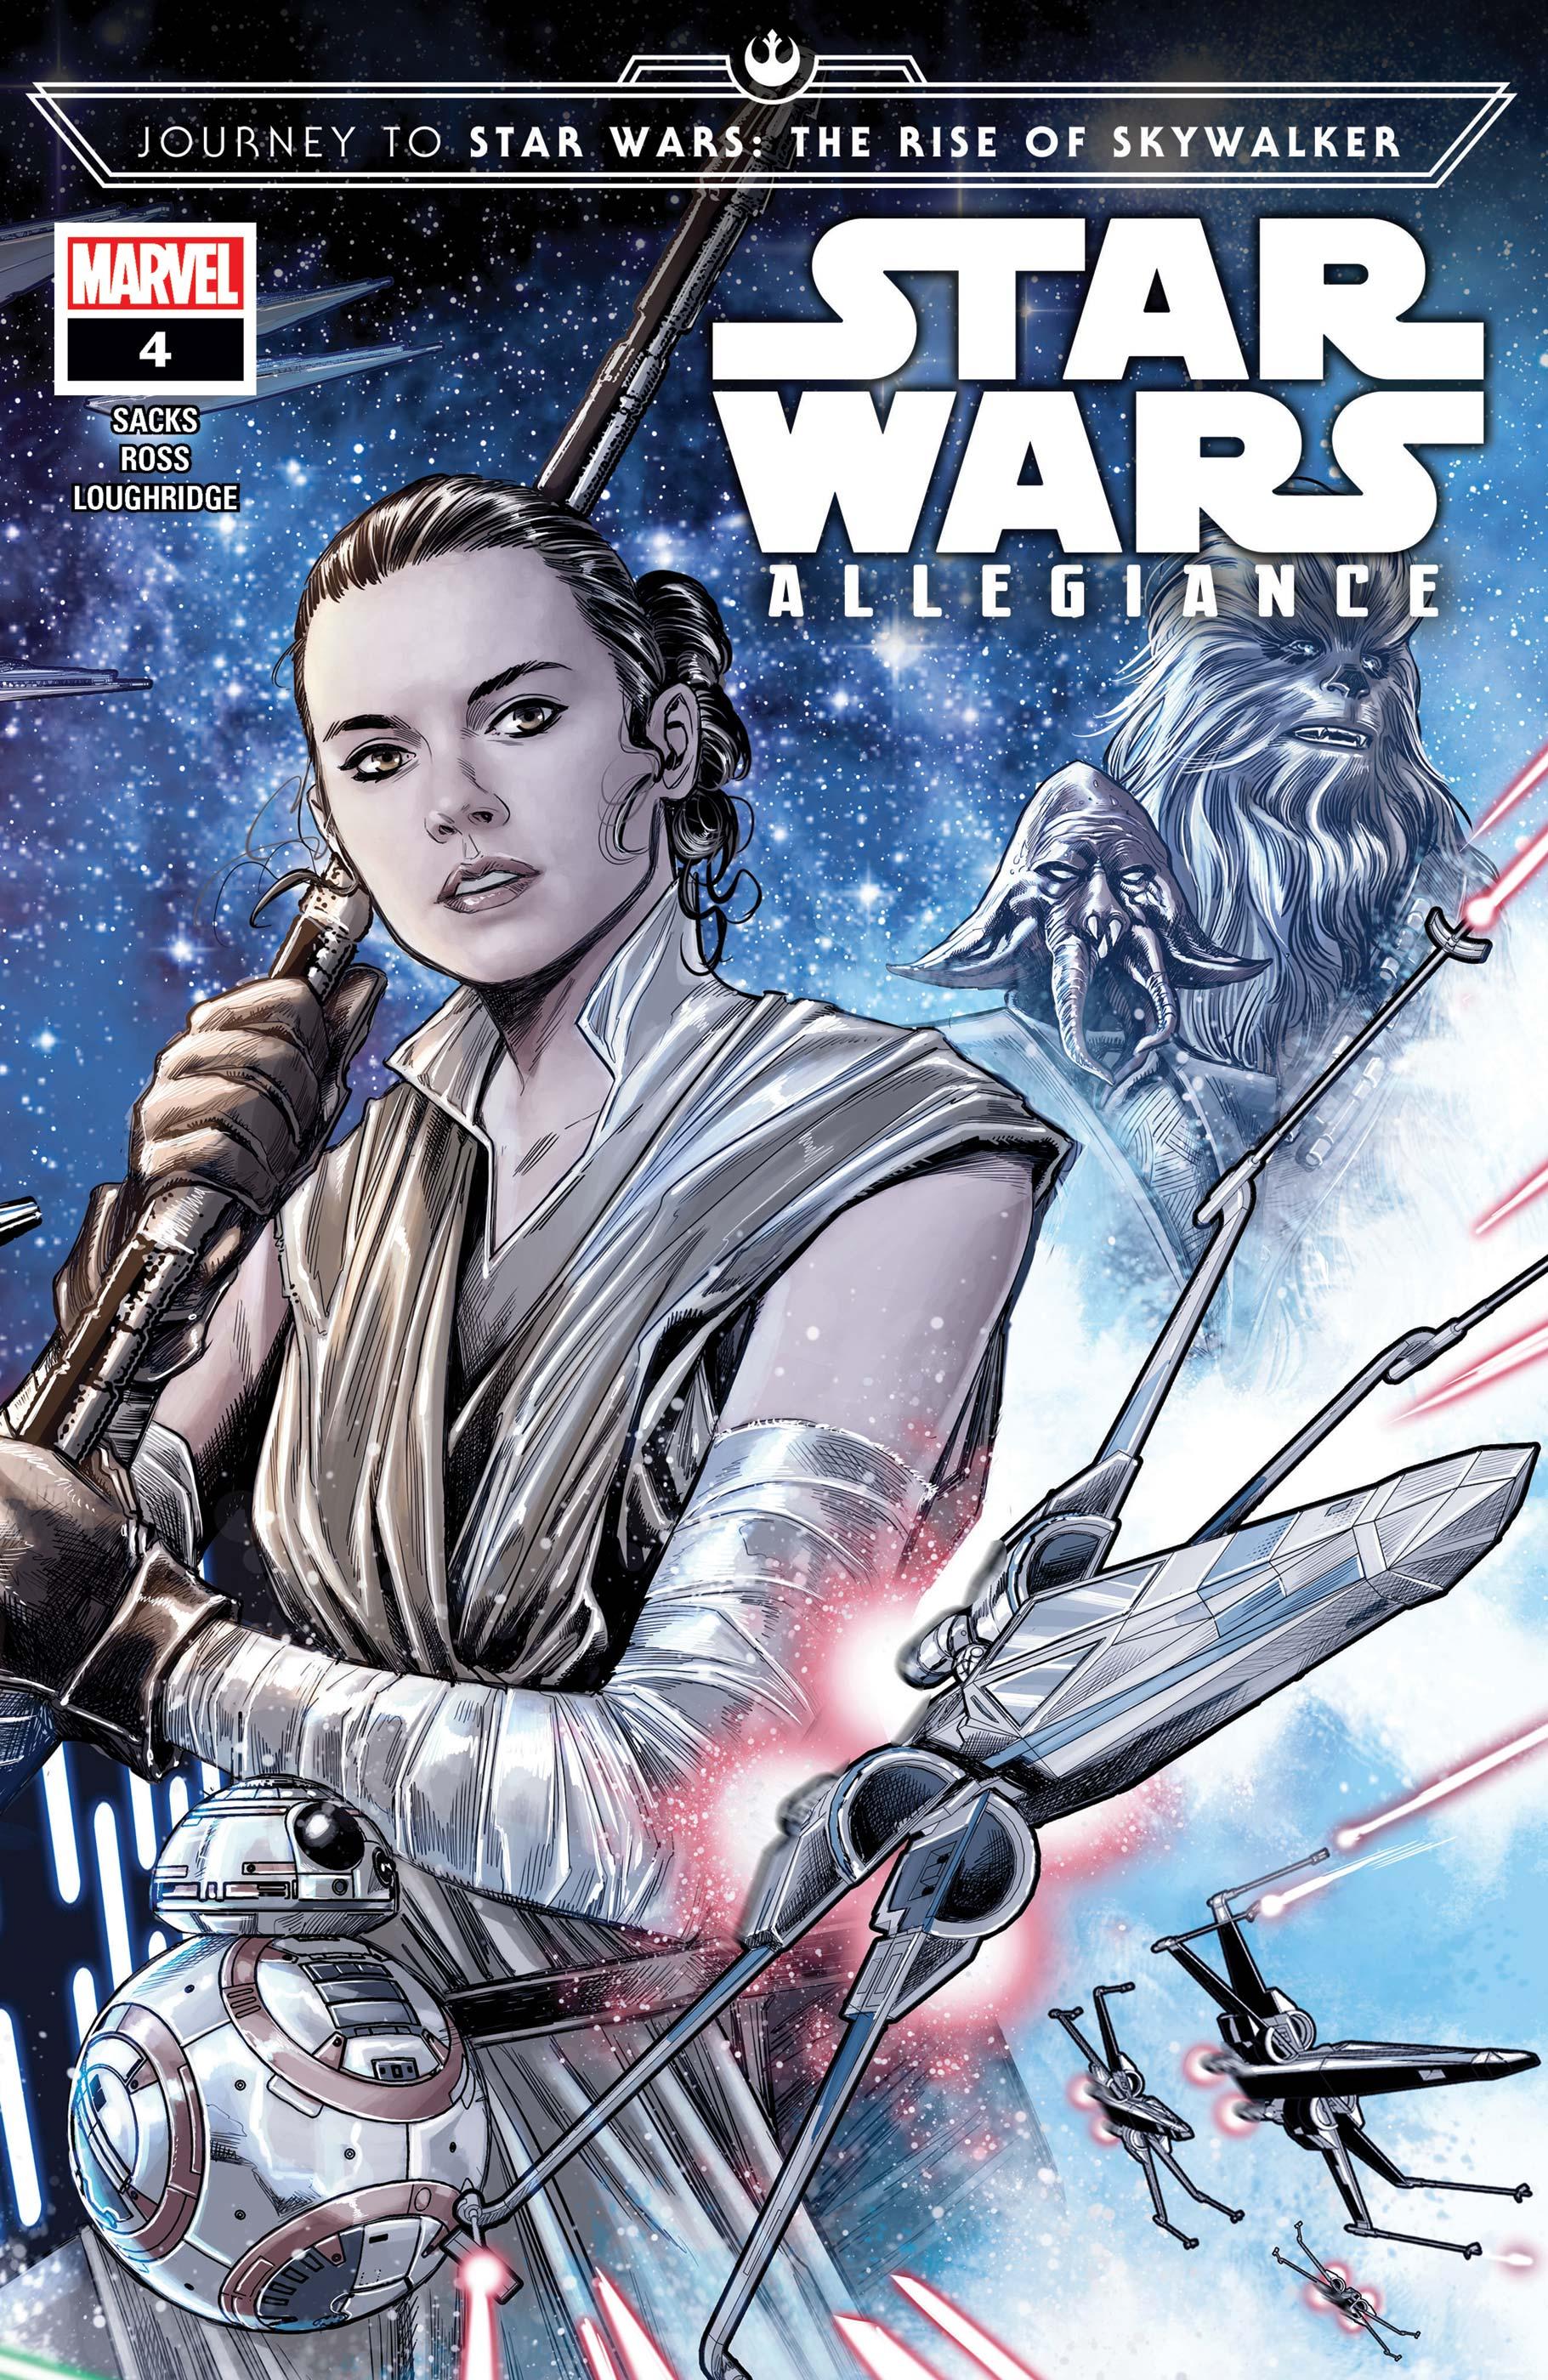 Journey to Star Wars: The Rise of Skywalker - Allegiance (2019) #4